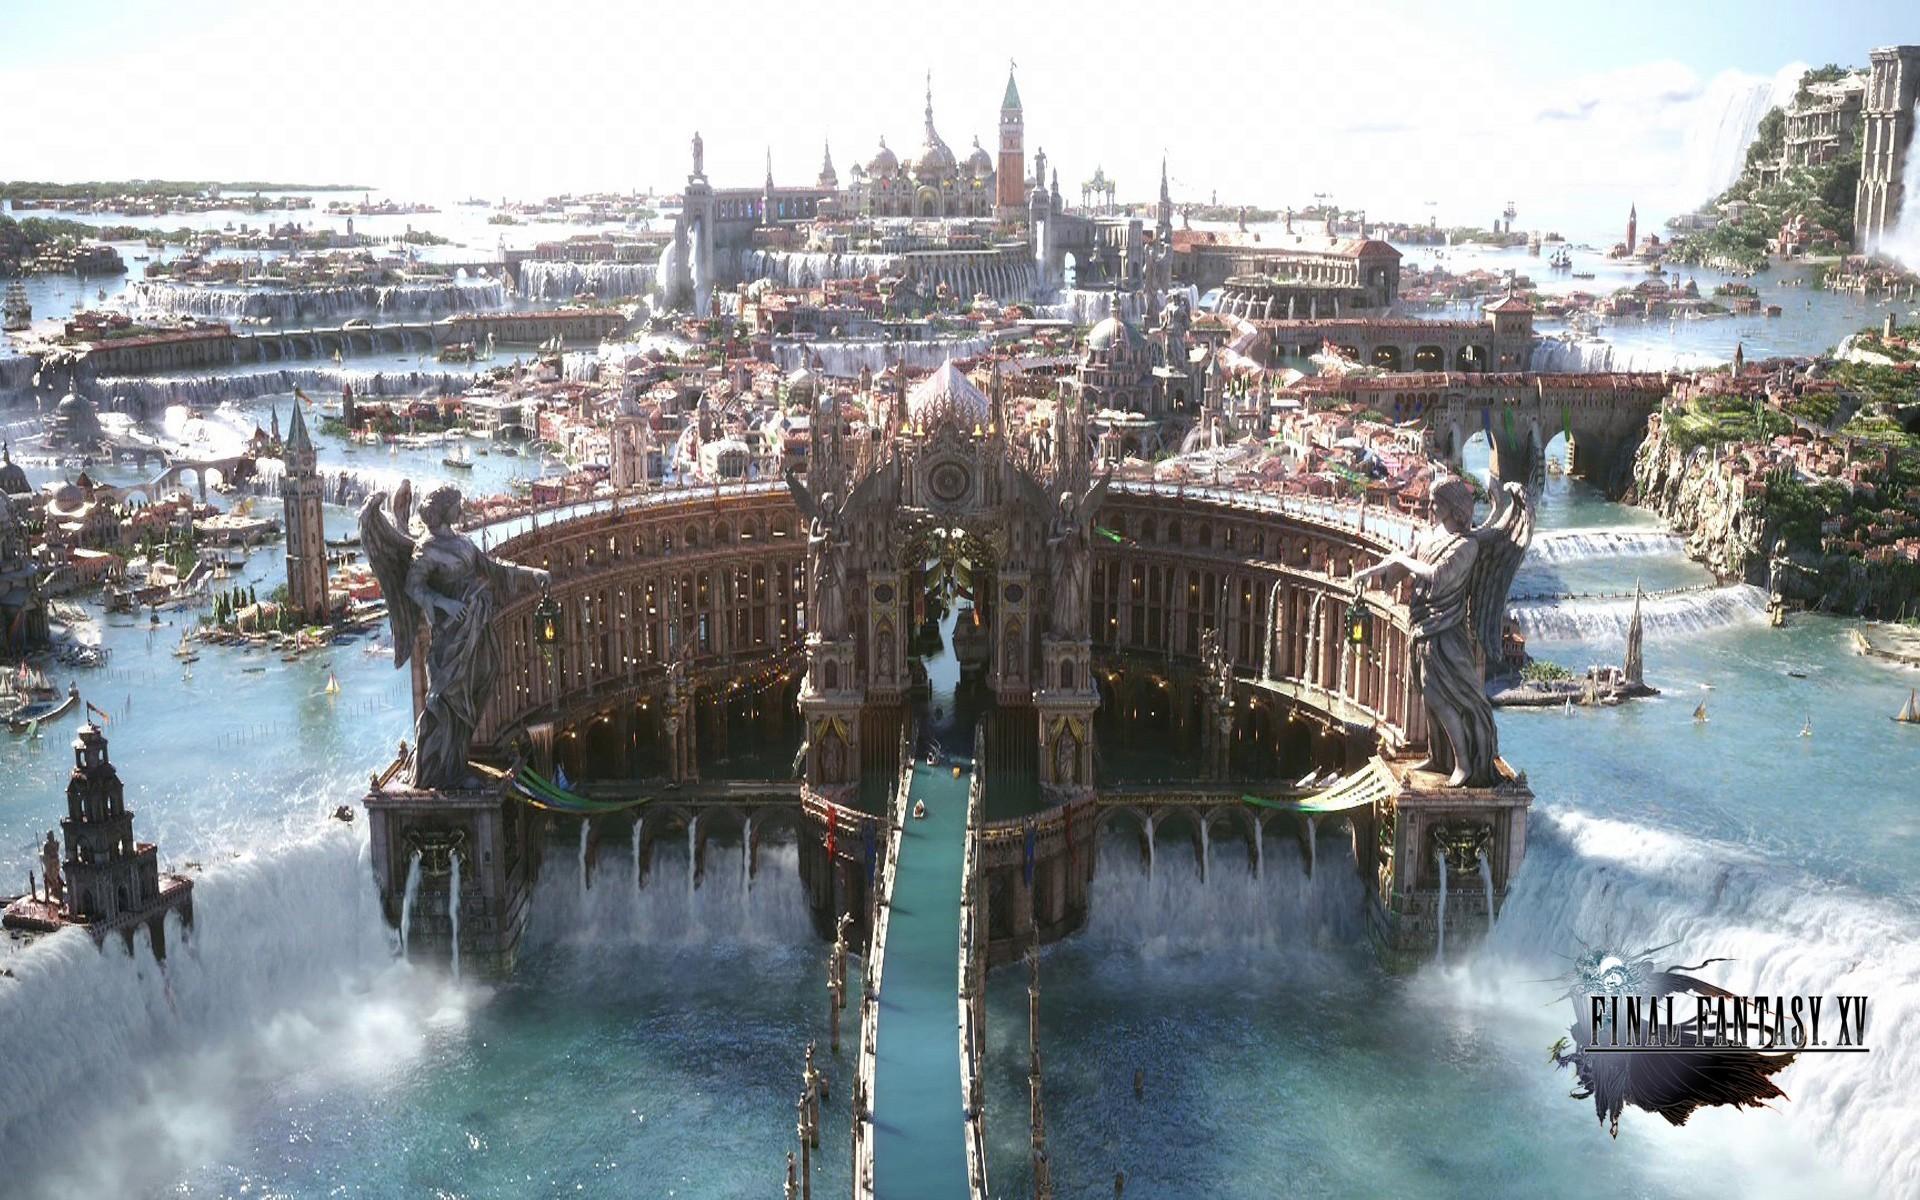 Final Fantasy XV game HD wallpaper